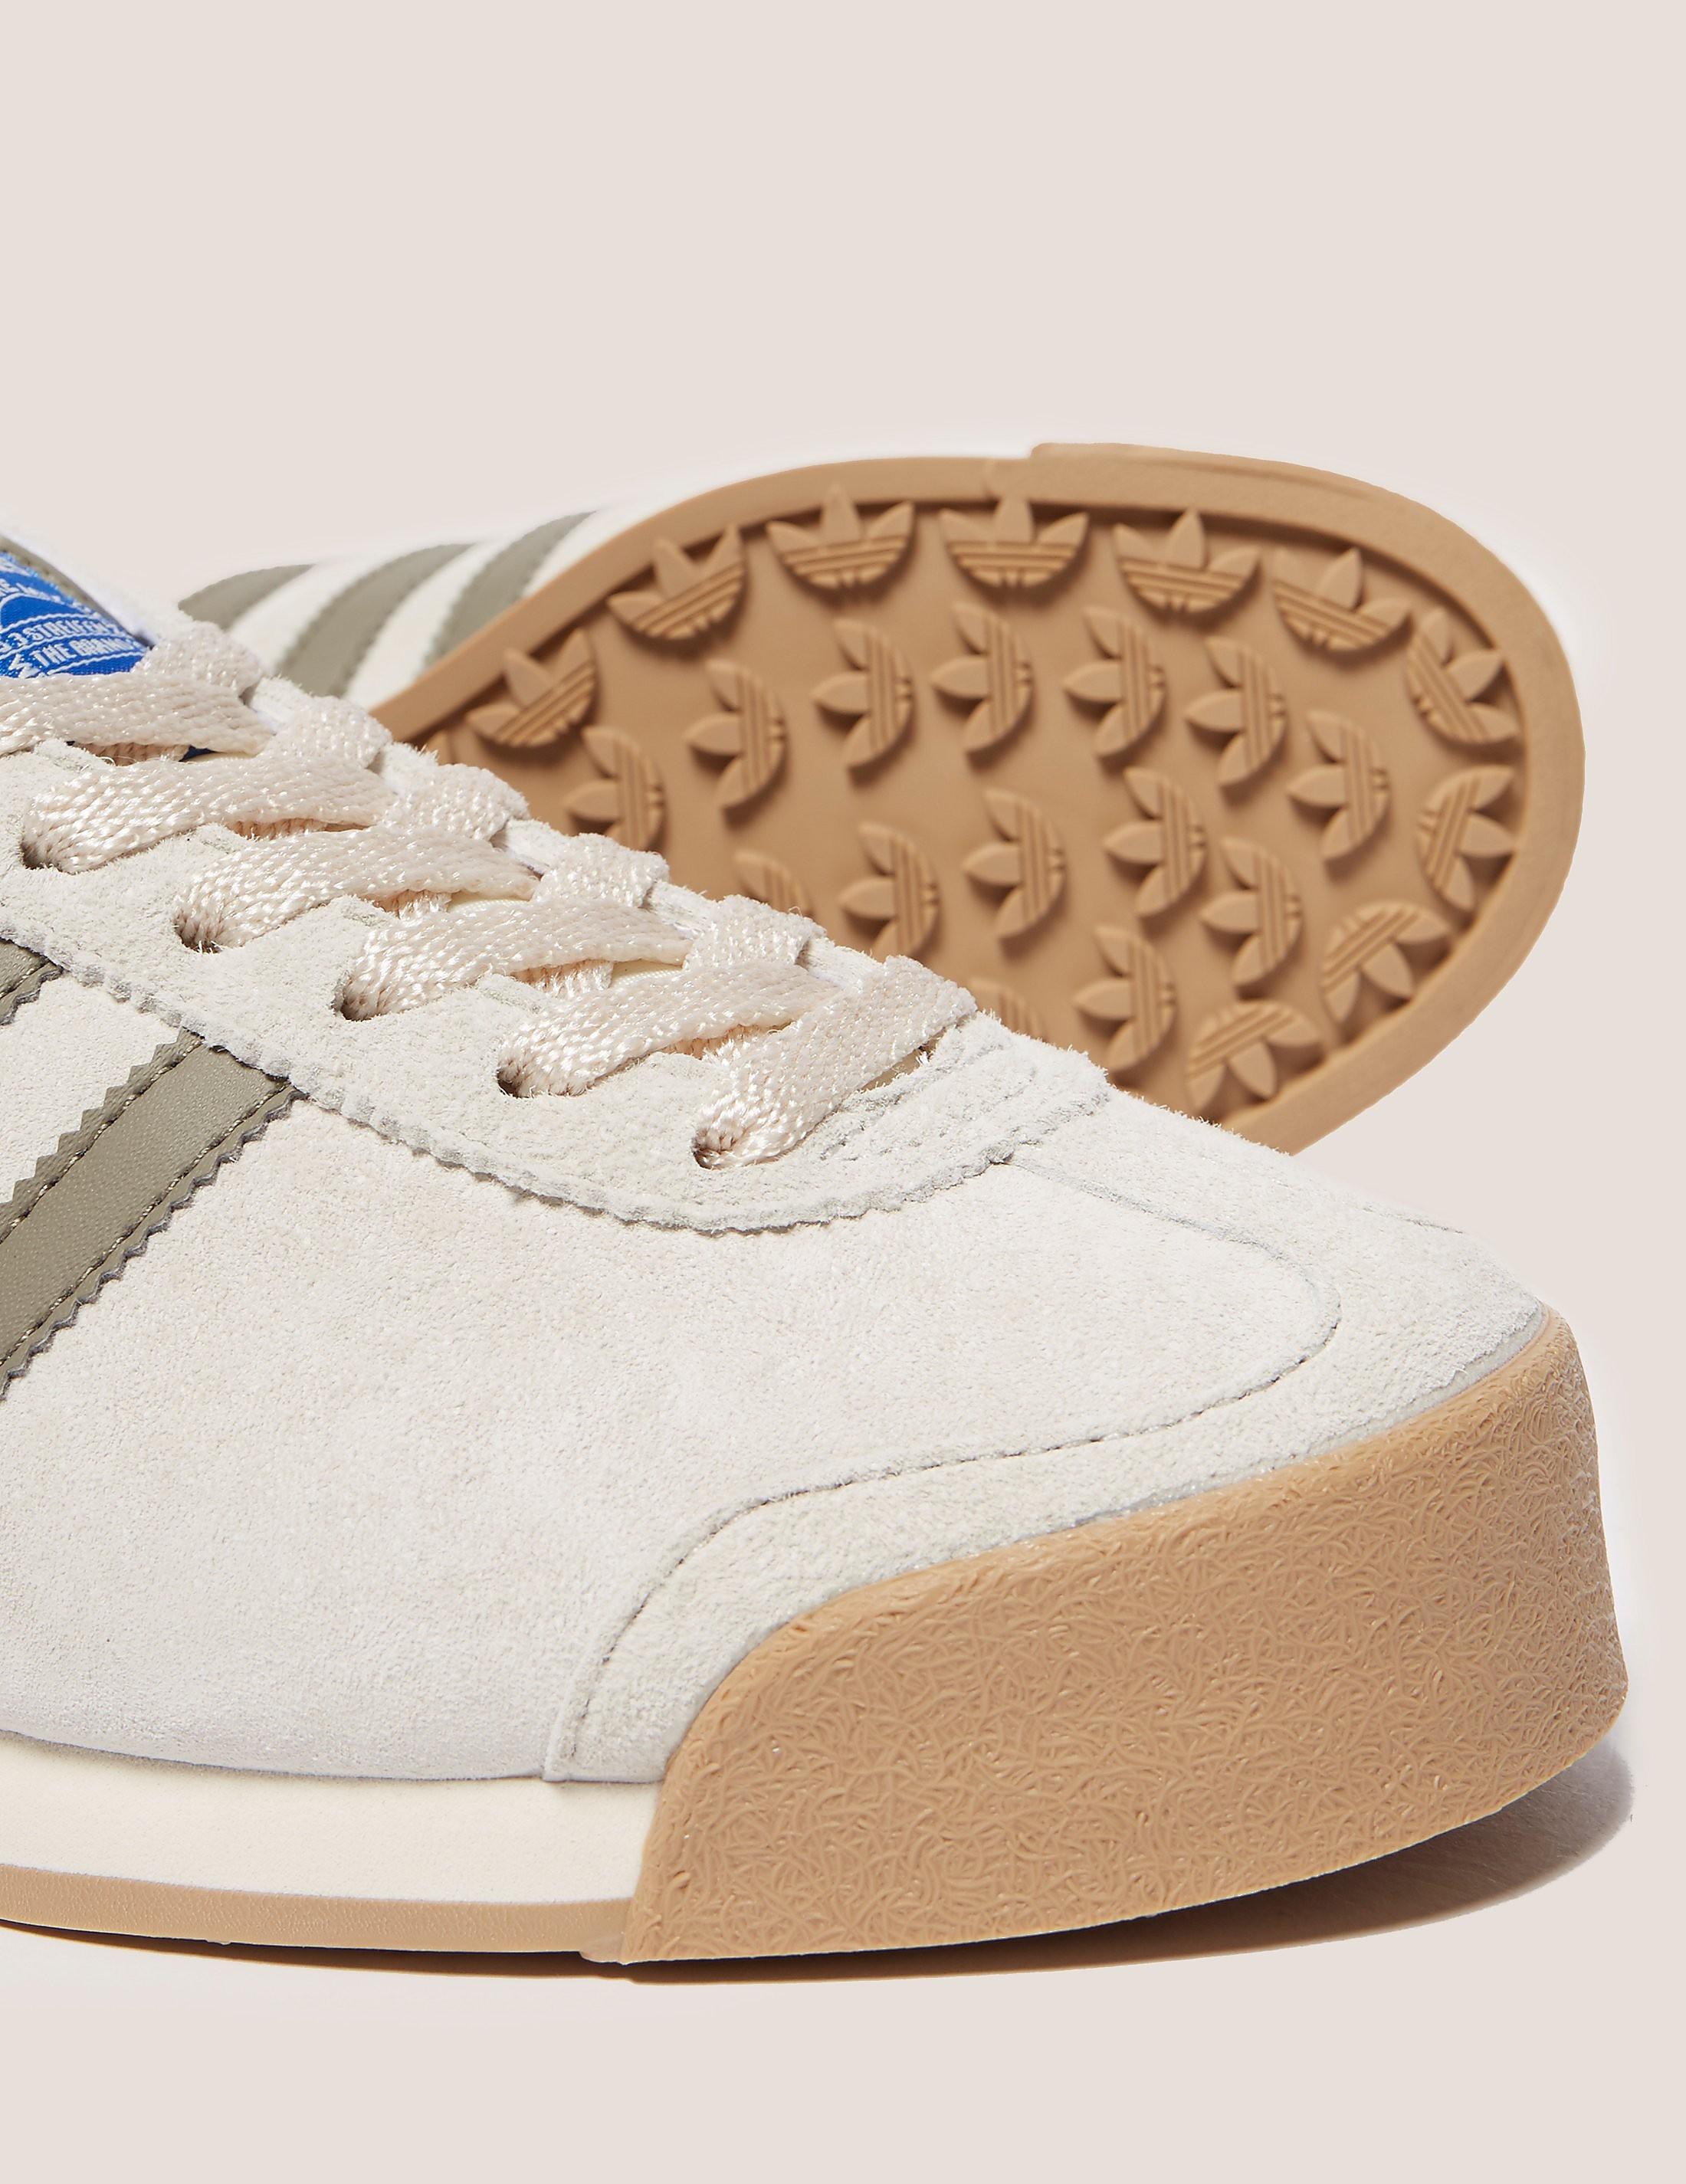 adidas Originals Samoa Vintage